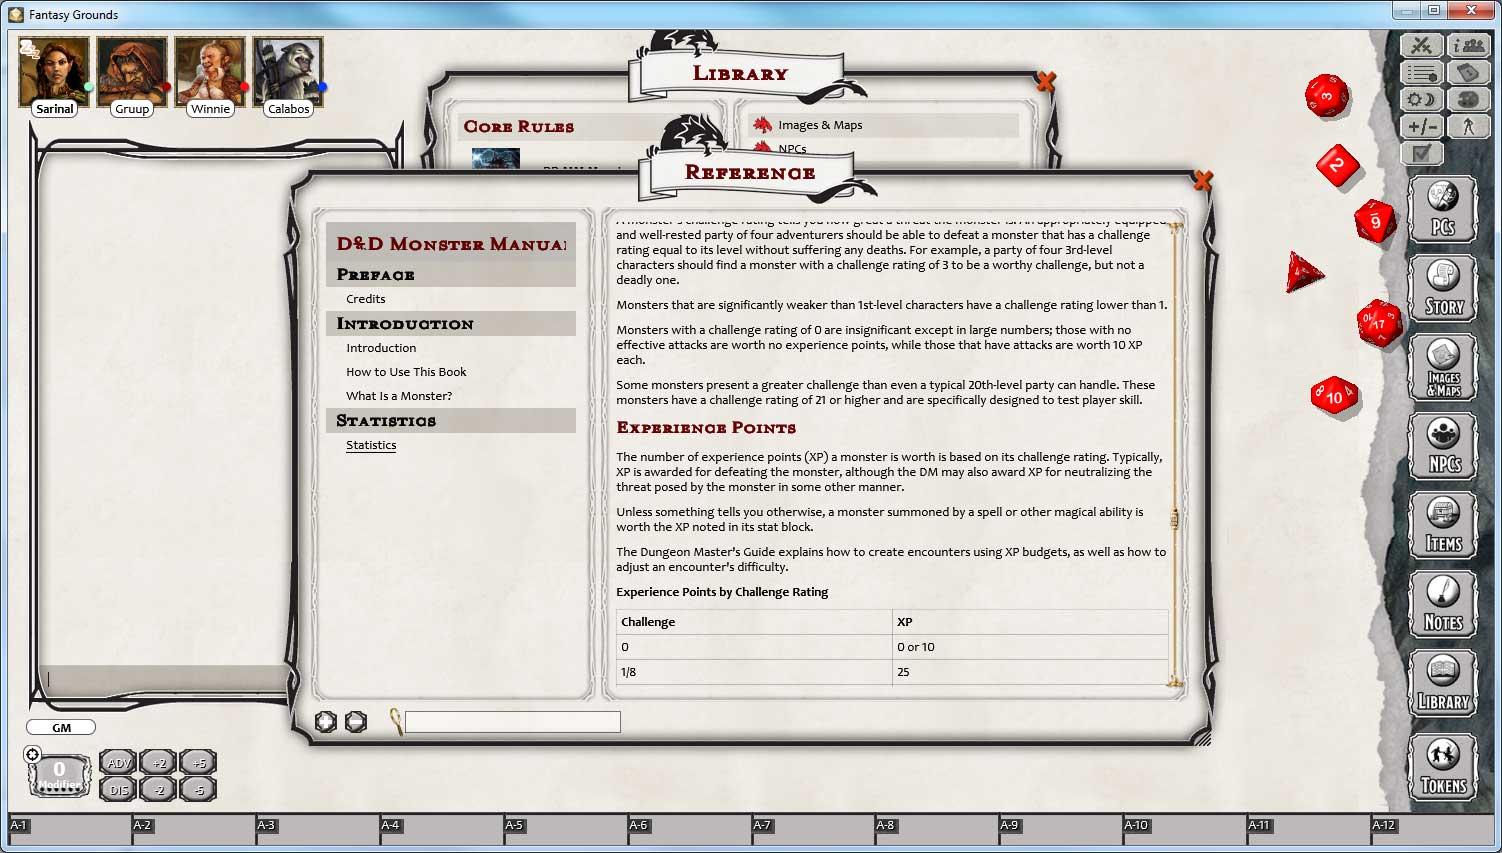 Fantasy Grounds - D&D Monster Manual screenshot